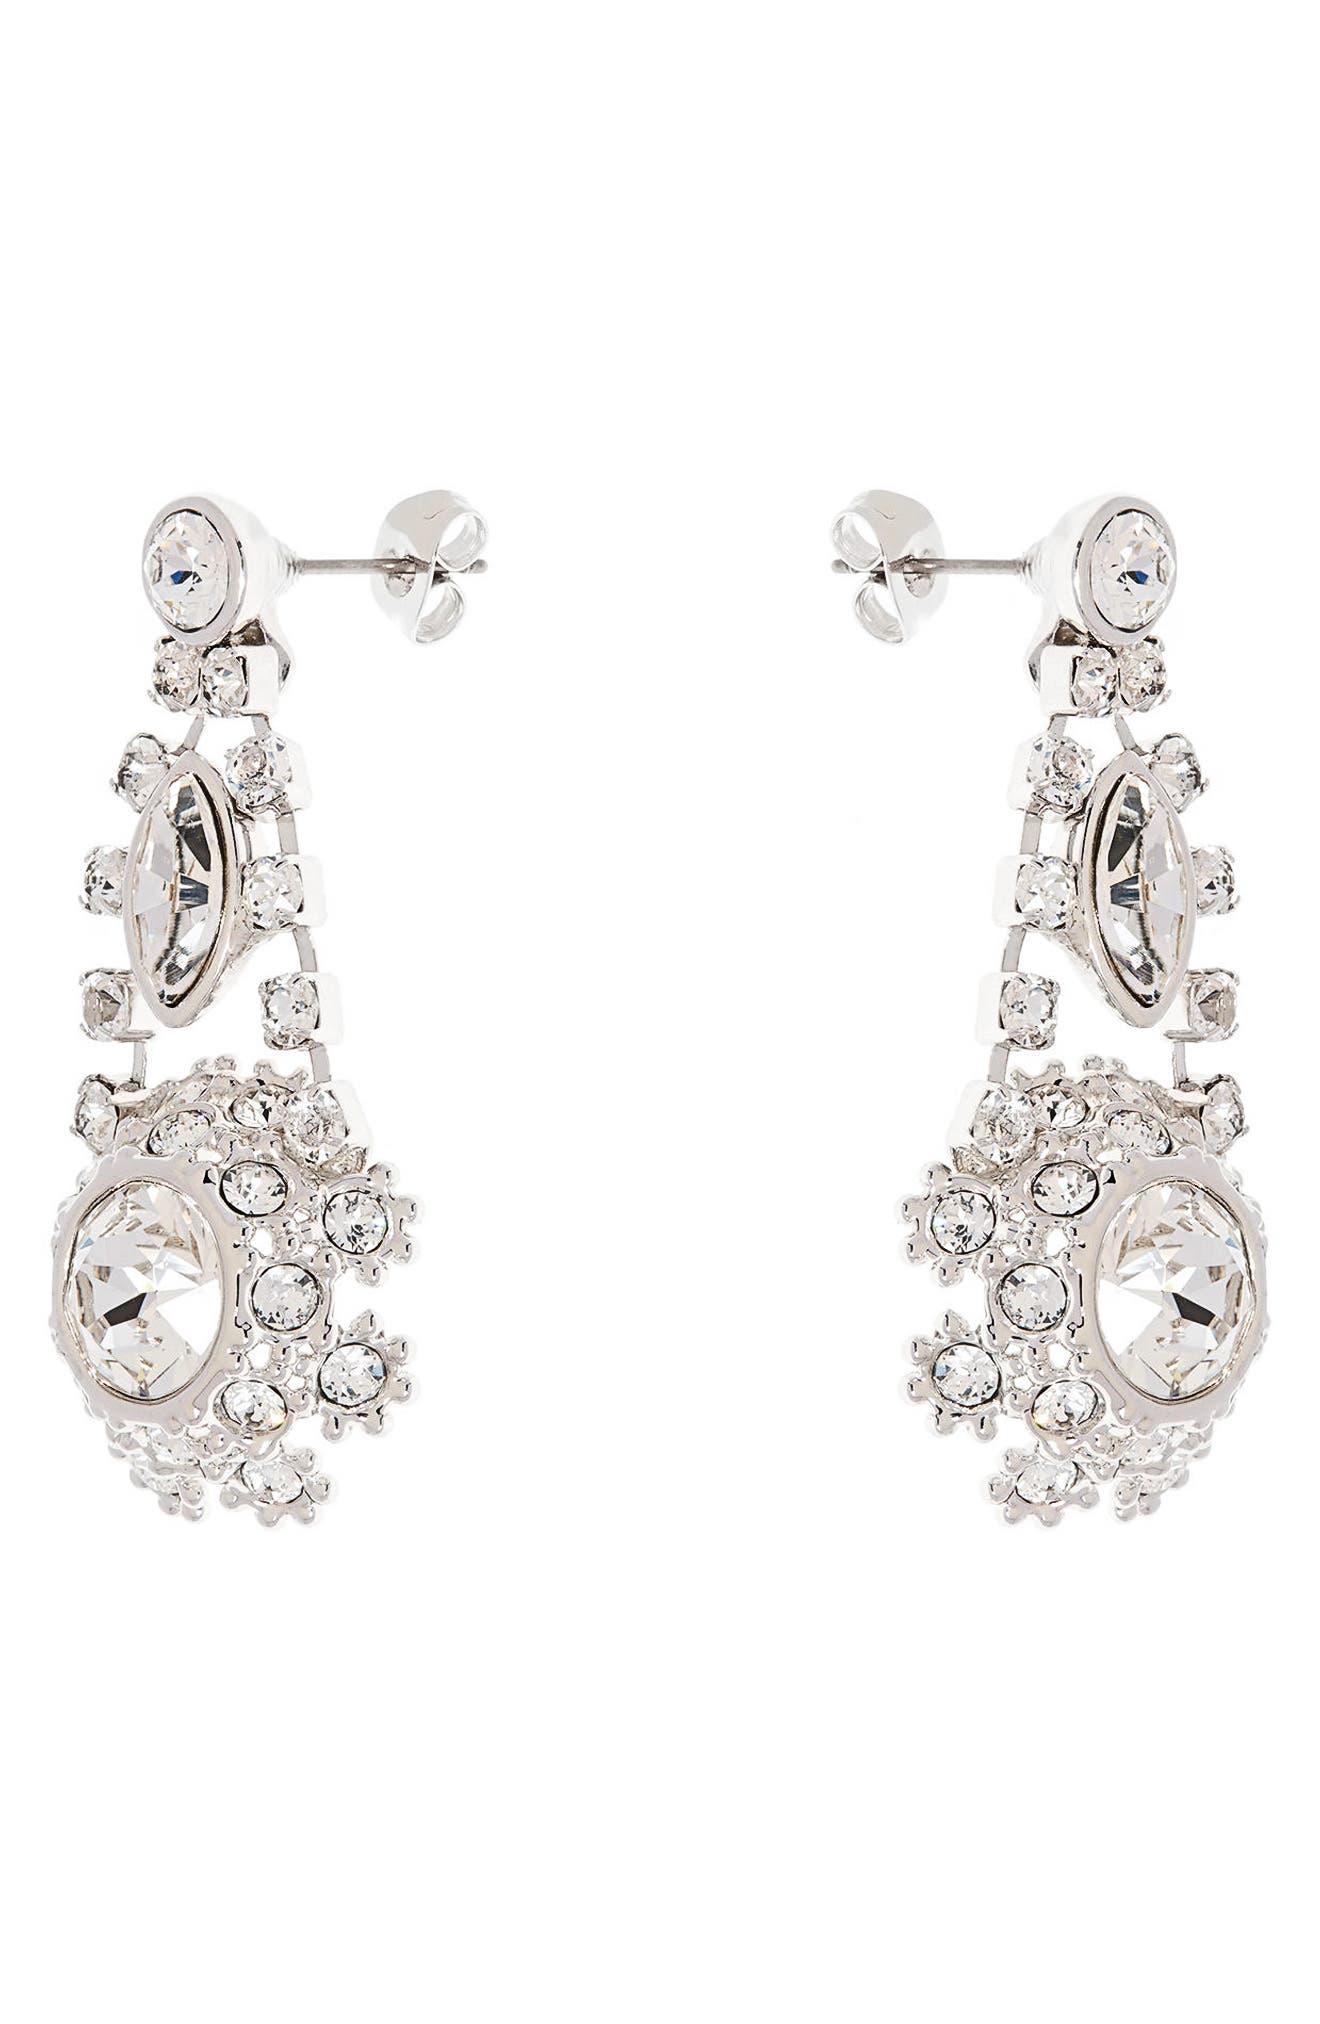 Crystal Daisy Lace Drop Earrings,                             Alternate thumbnail 2, color,                             Clear